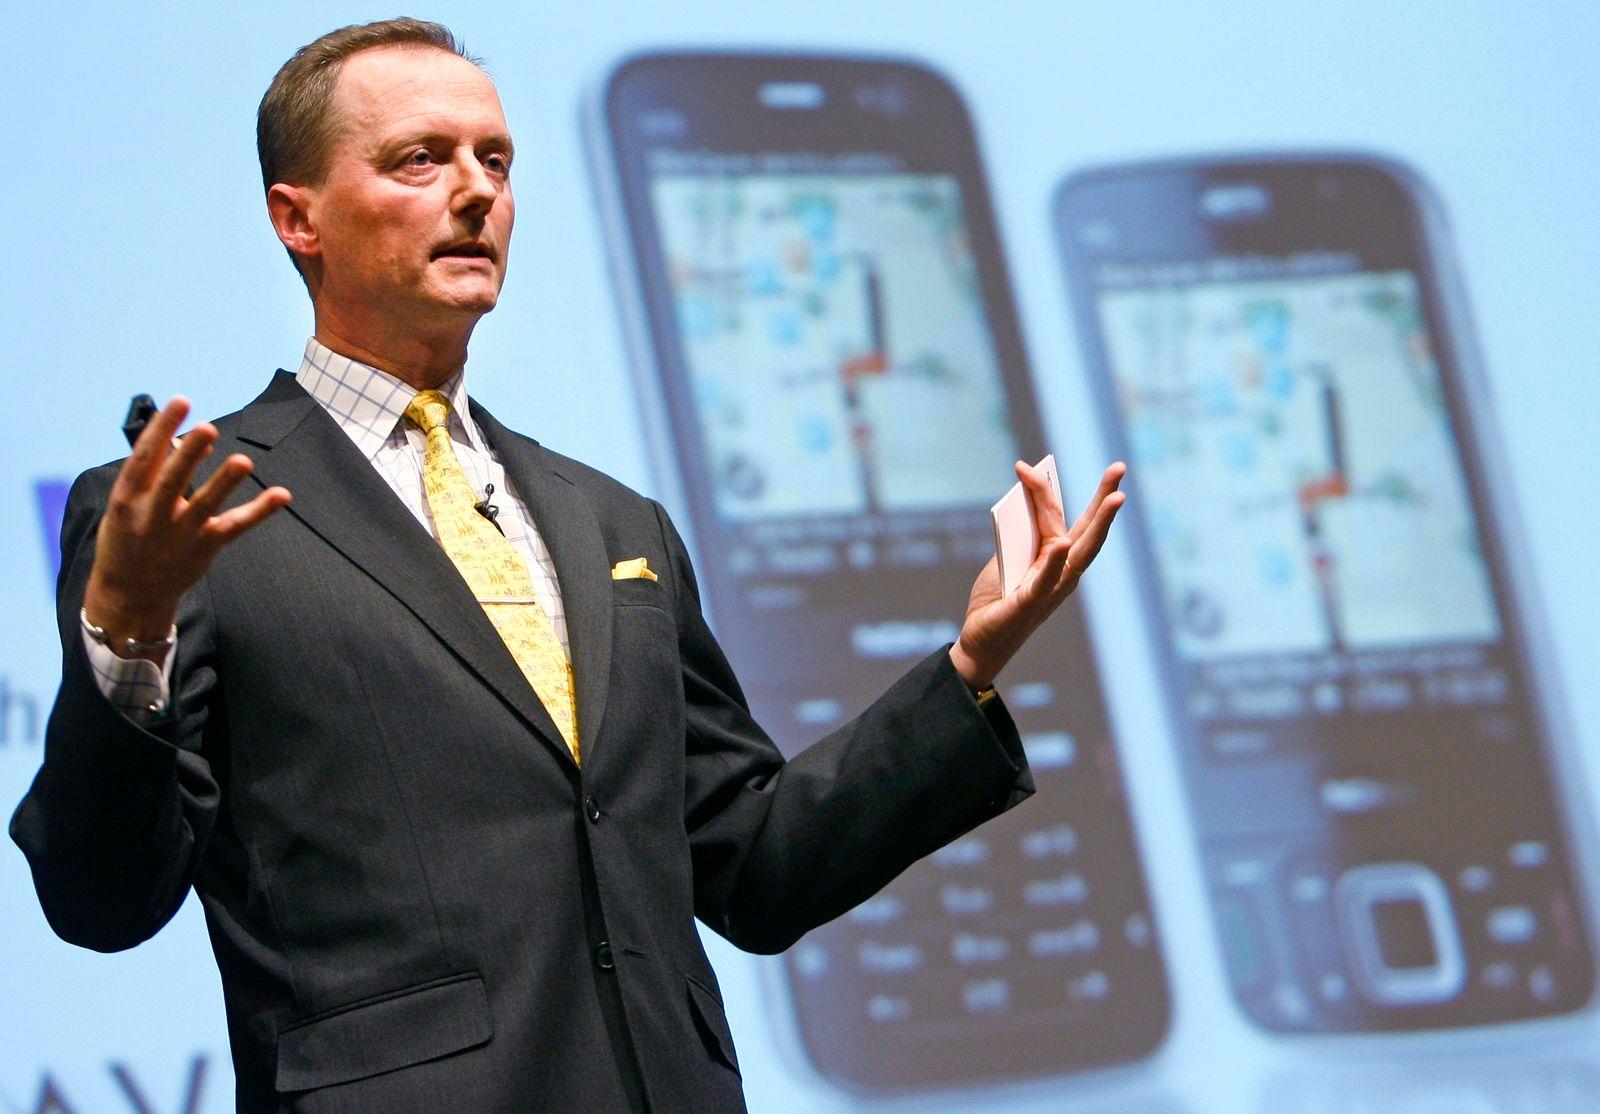 Niklas Savander / Nokia / Handy